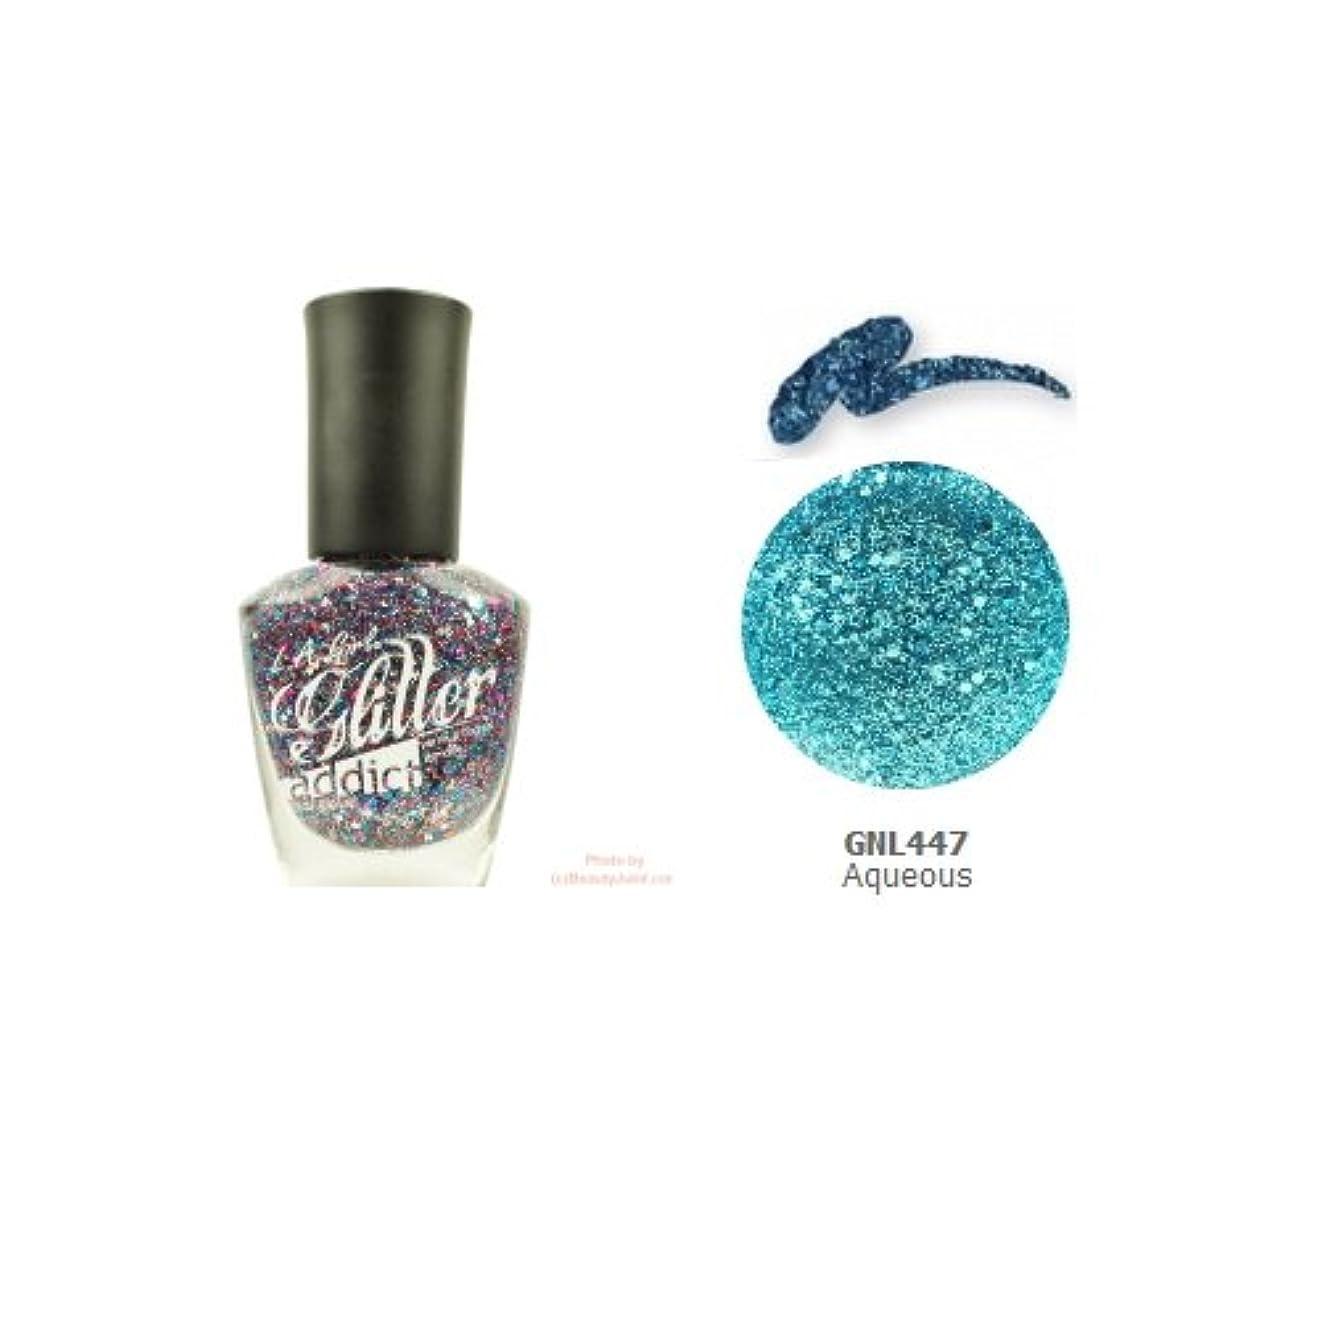 (6 Pack) LA GIRL Glitter Addict Polish - Aqueous (並行輸入品)